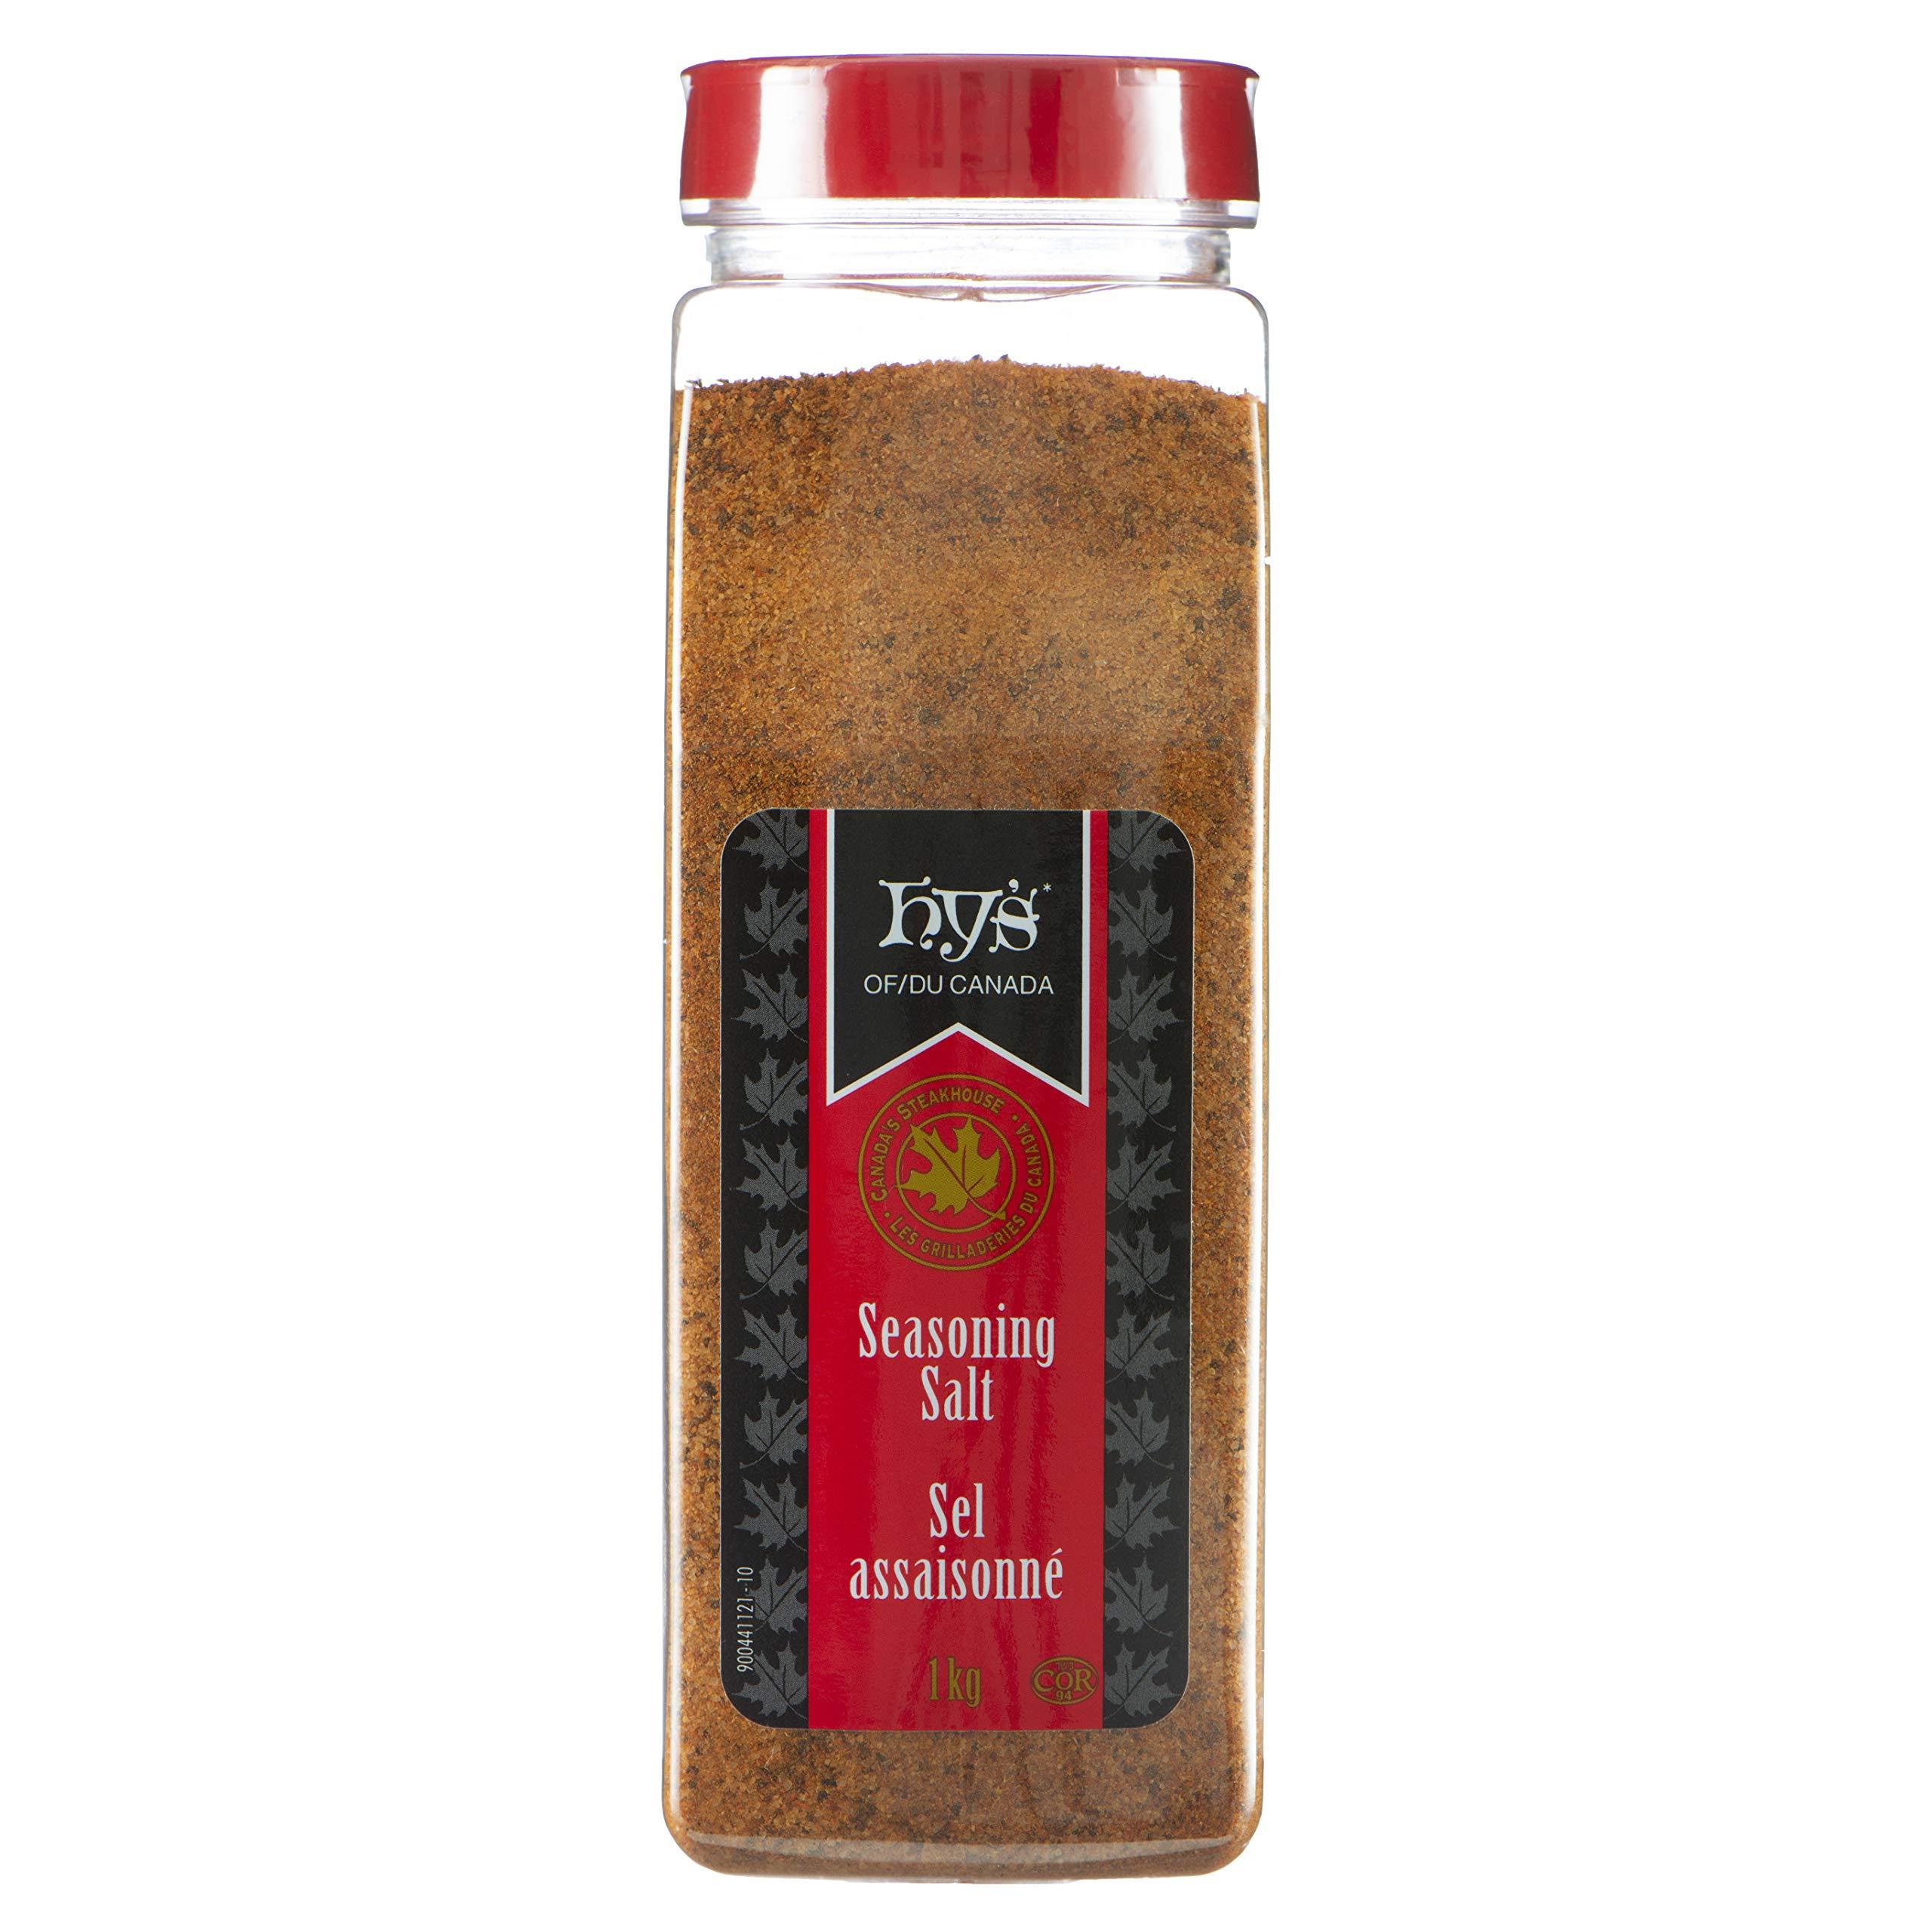 Hy's Seasoning Salt, 1 Kilograms/35.27oz {Imported from Canada}